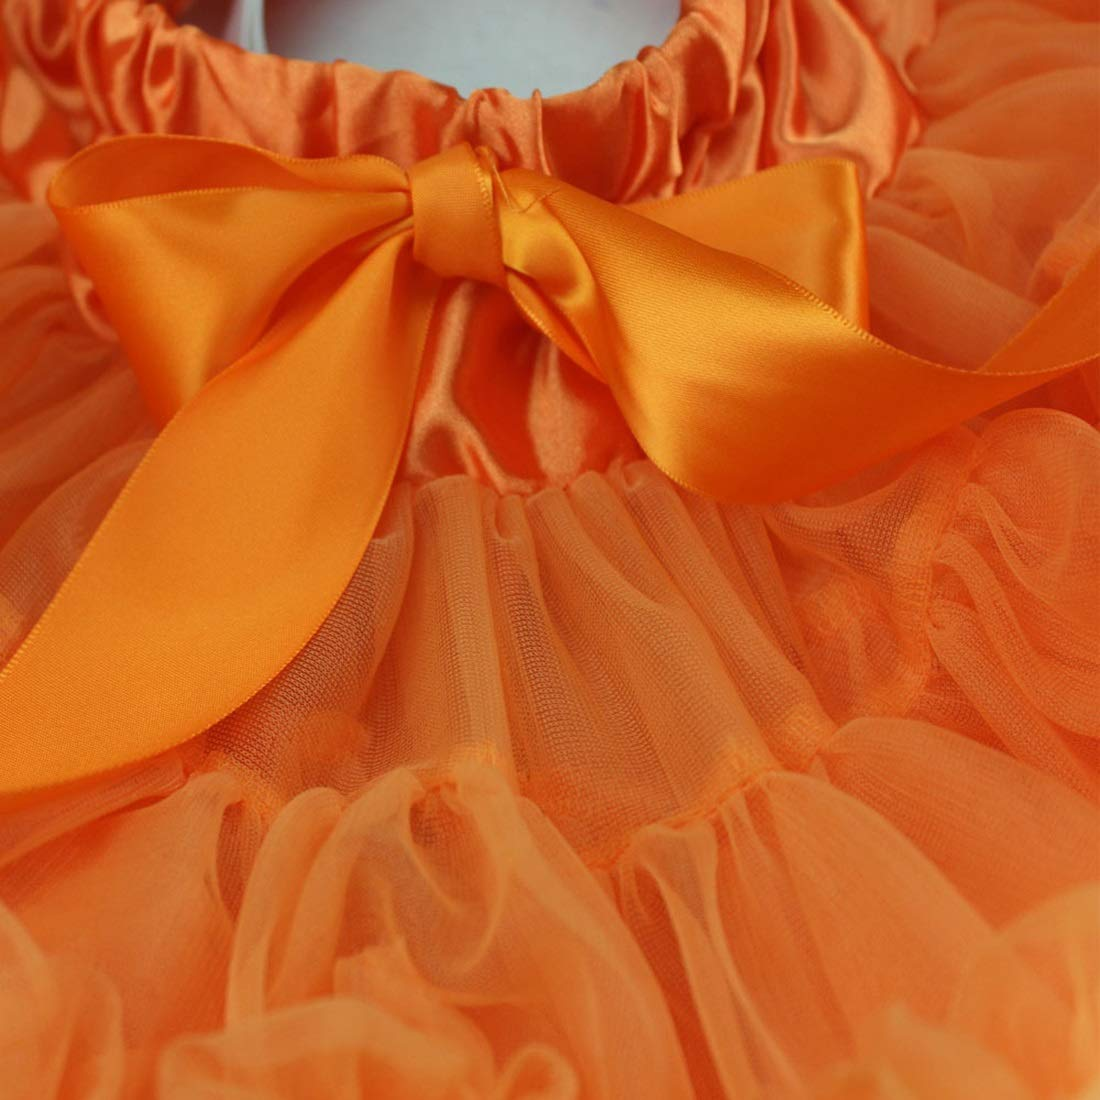 CEFULTY Pleated Fluffy Tutu Skirt Soft Pettiskirt for Baby Girls Toddlers Children Color : Orange, Size : 110CM